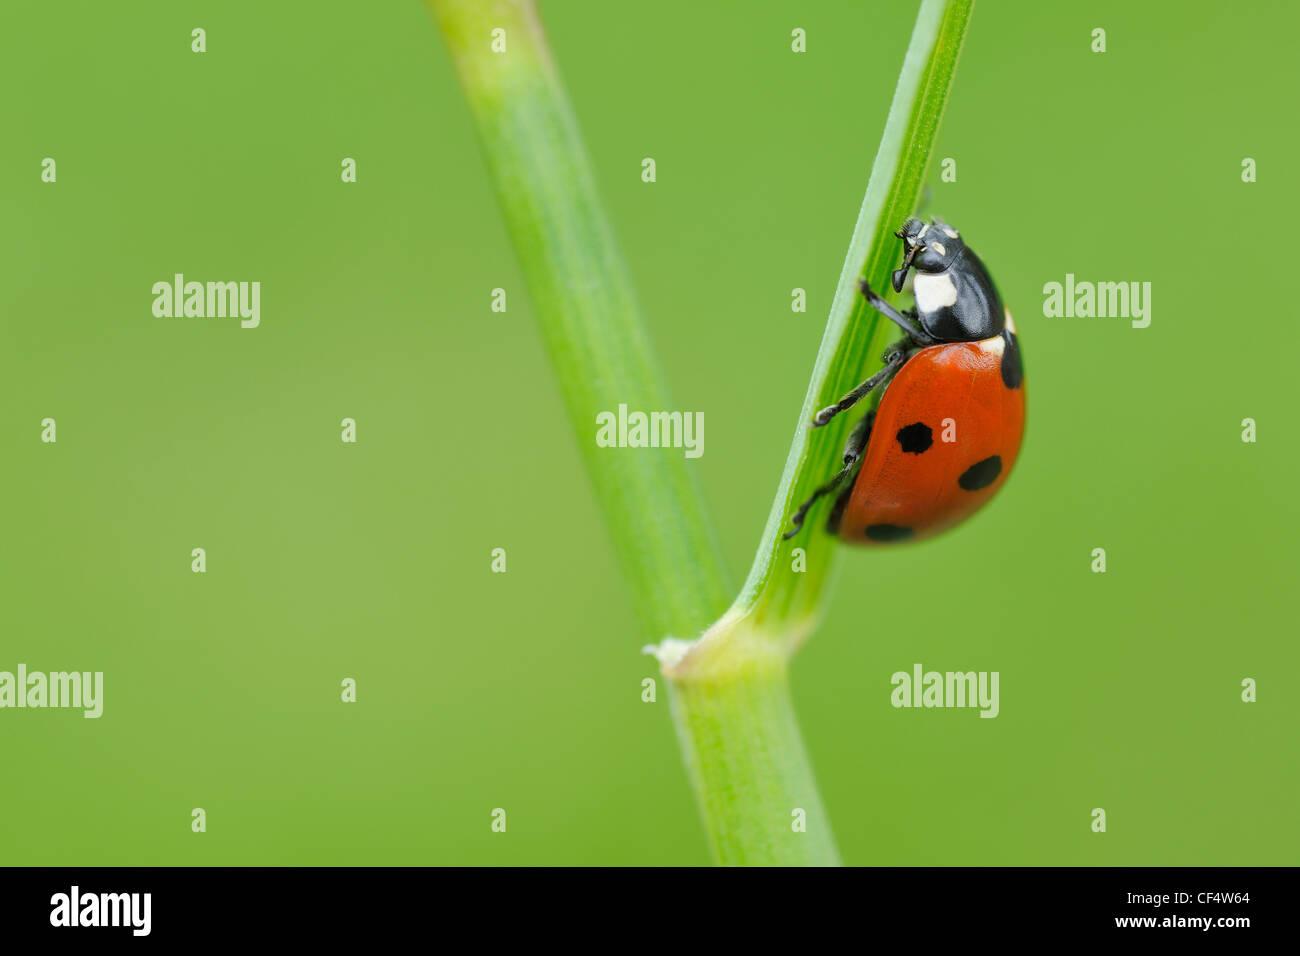 Germany, Bavaria, Franconia, Seven spot lady bird perching on stem, close up - Stock Image